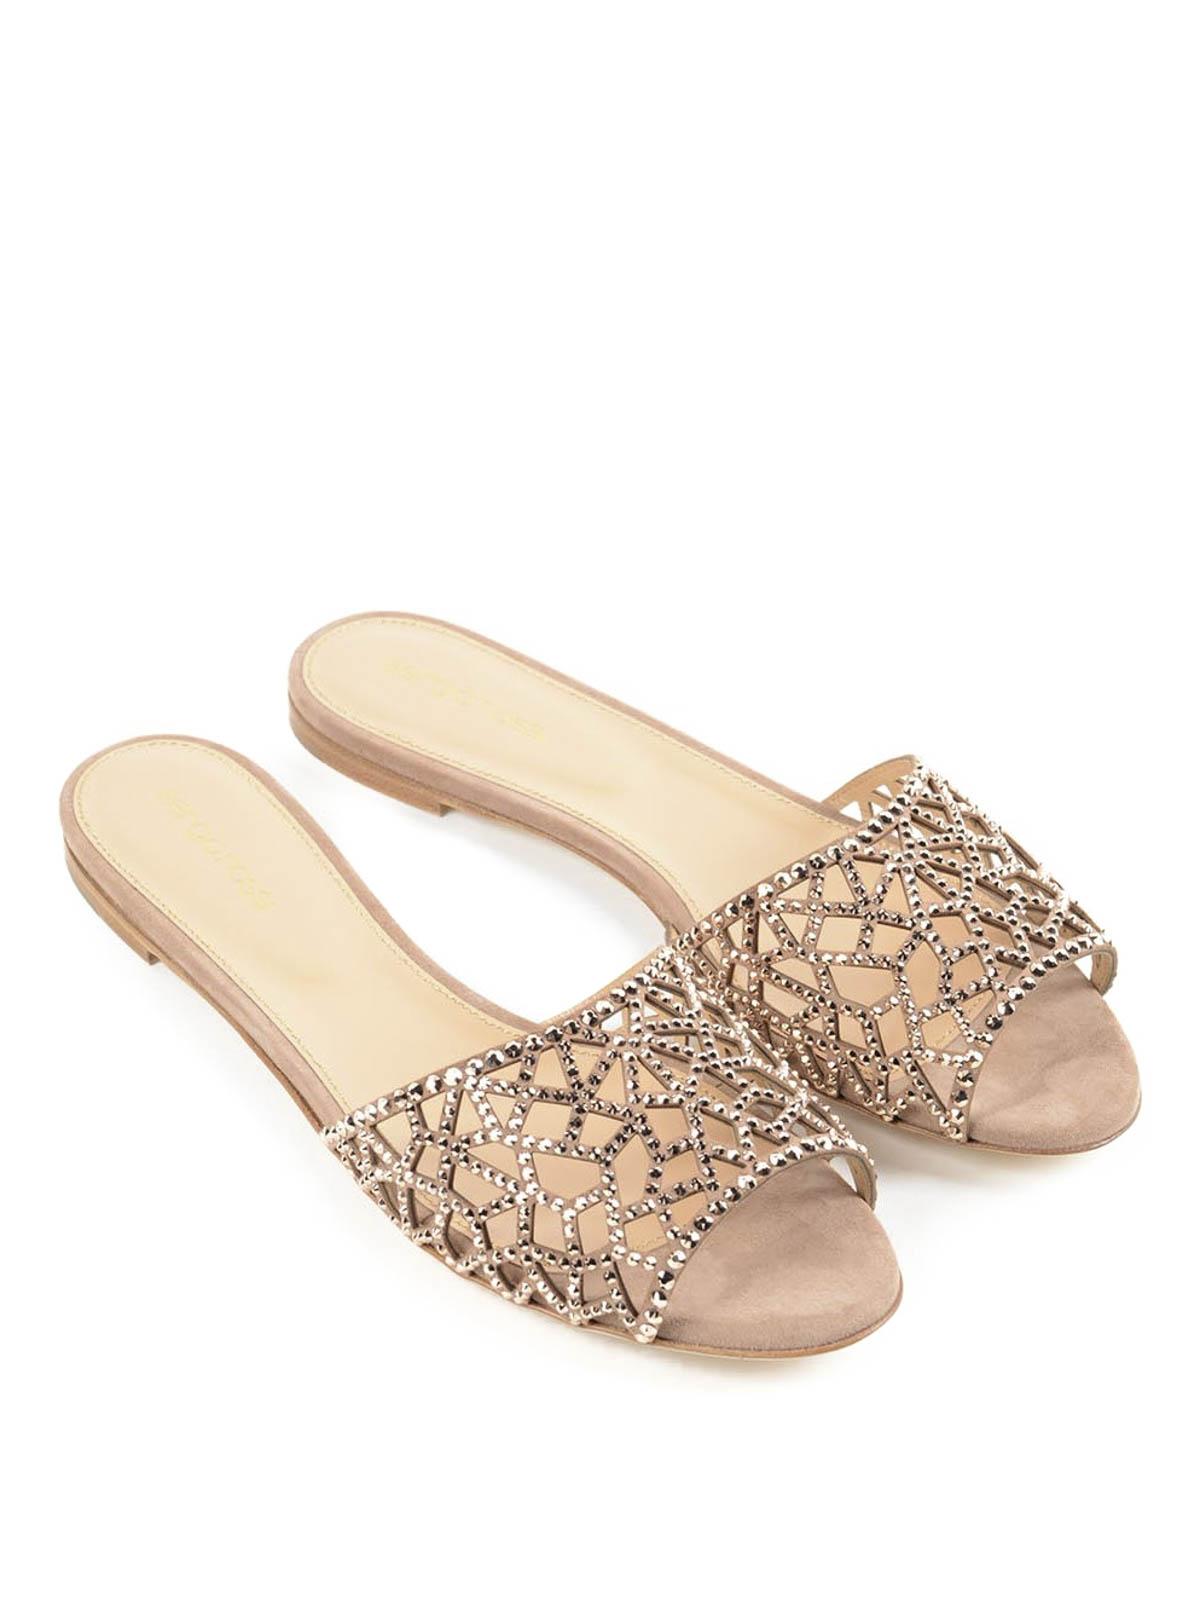 3ea3fc39645836 Sergio Rossi - Tresor crystal flat sandals - sandals - A75510 MAFM39 ...